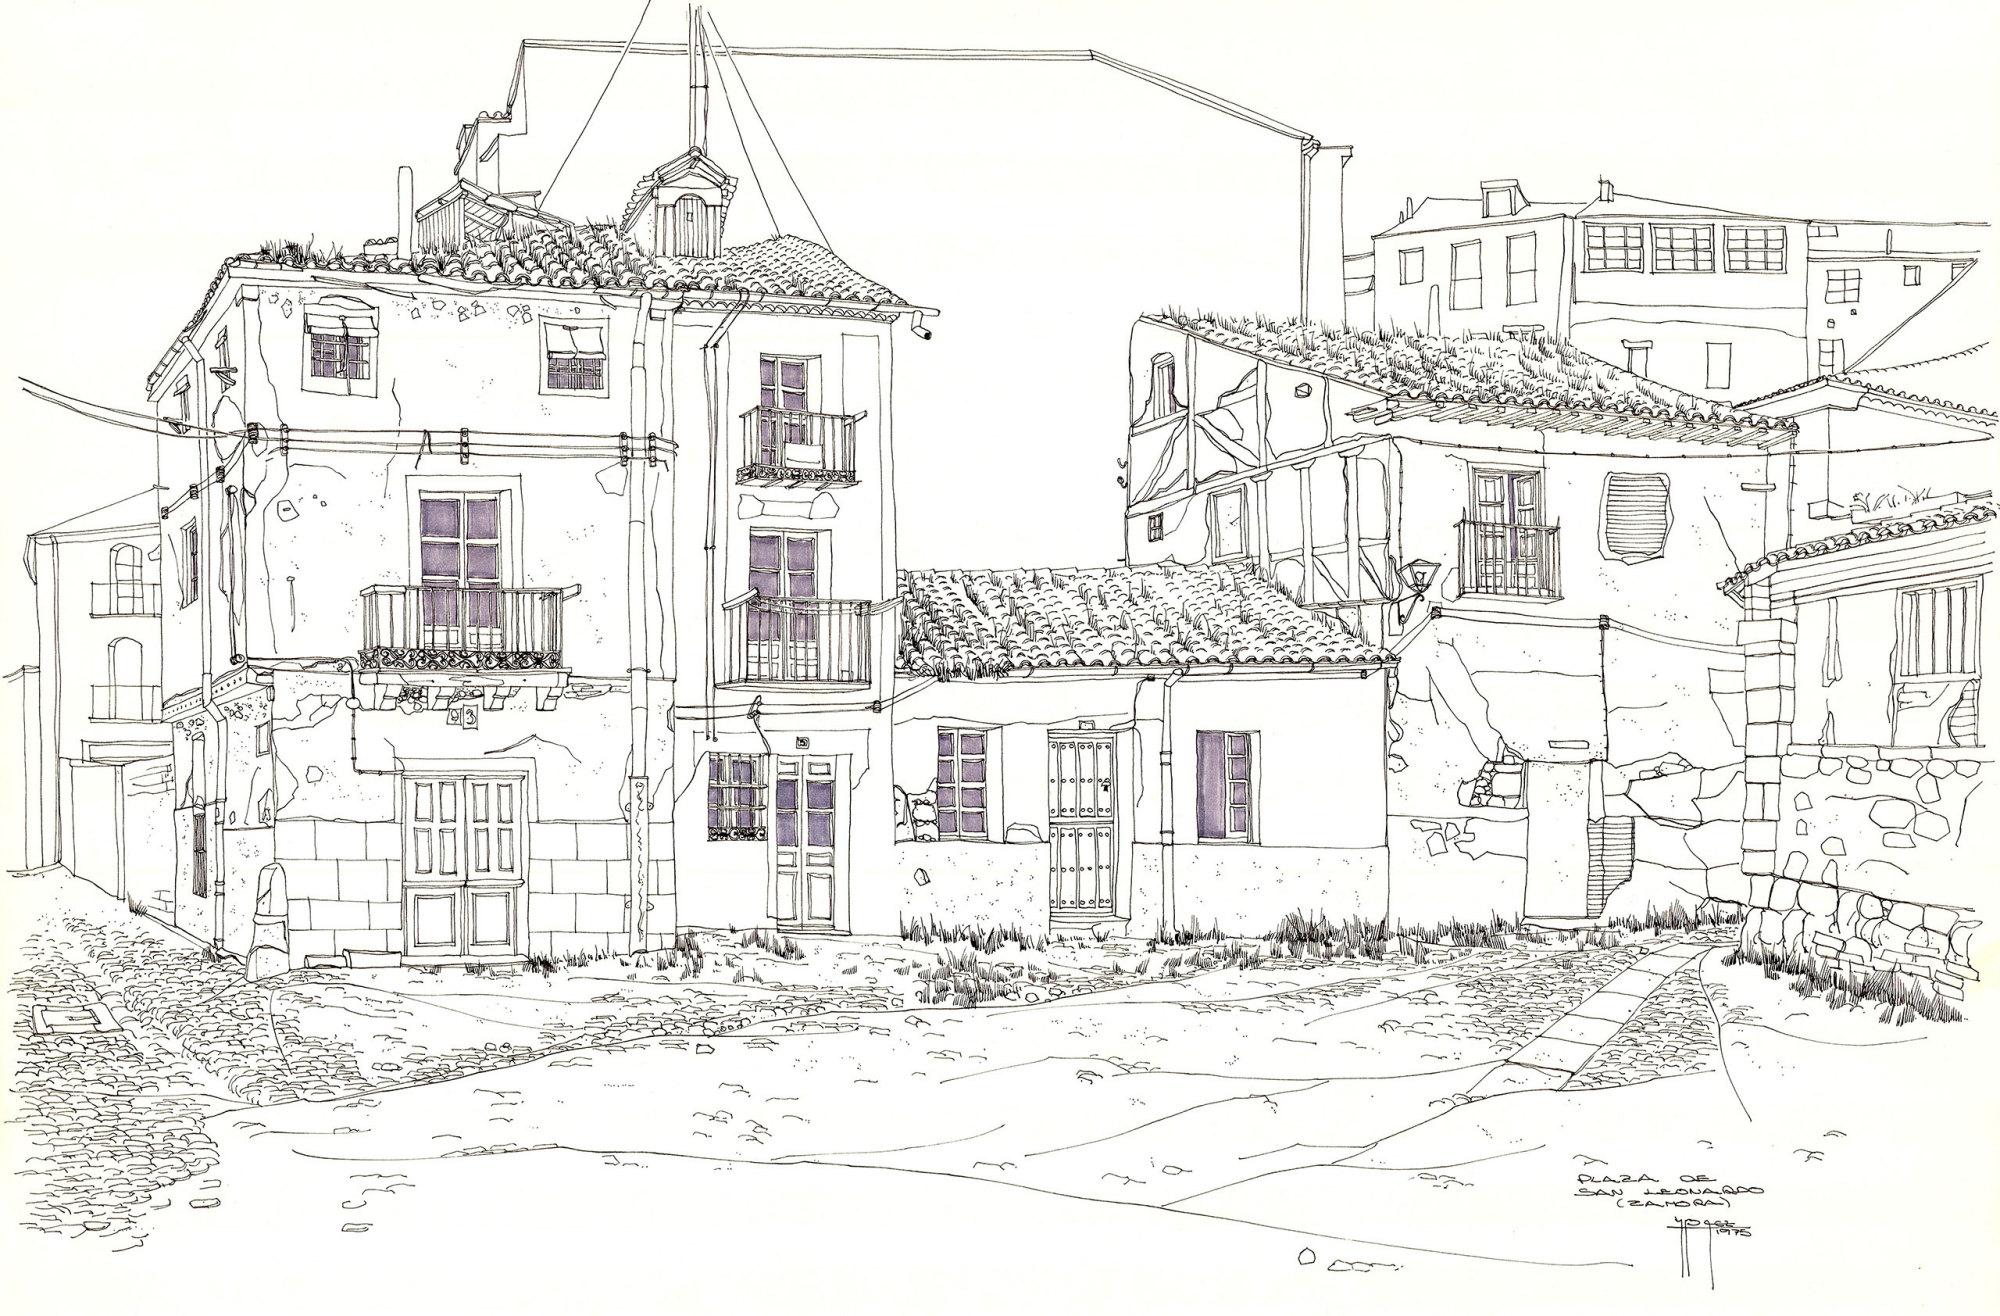 Architecture zamora juan manuel bez mezquita plaza san leonardo zamora ink 50x65 cm malvernweather Image collections